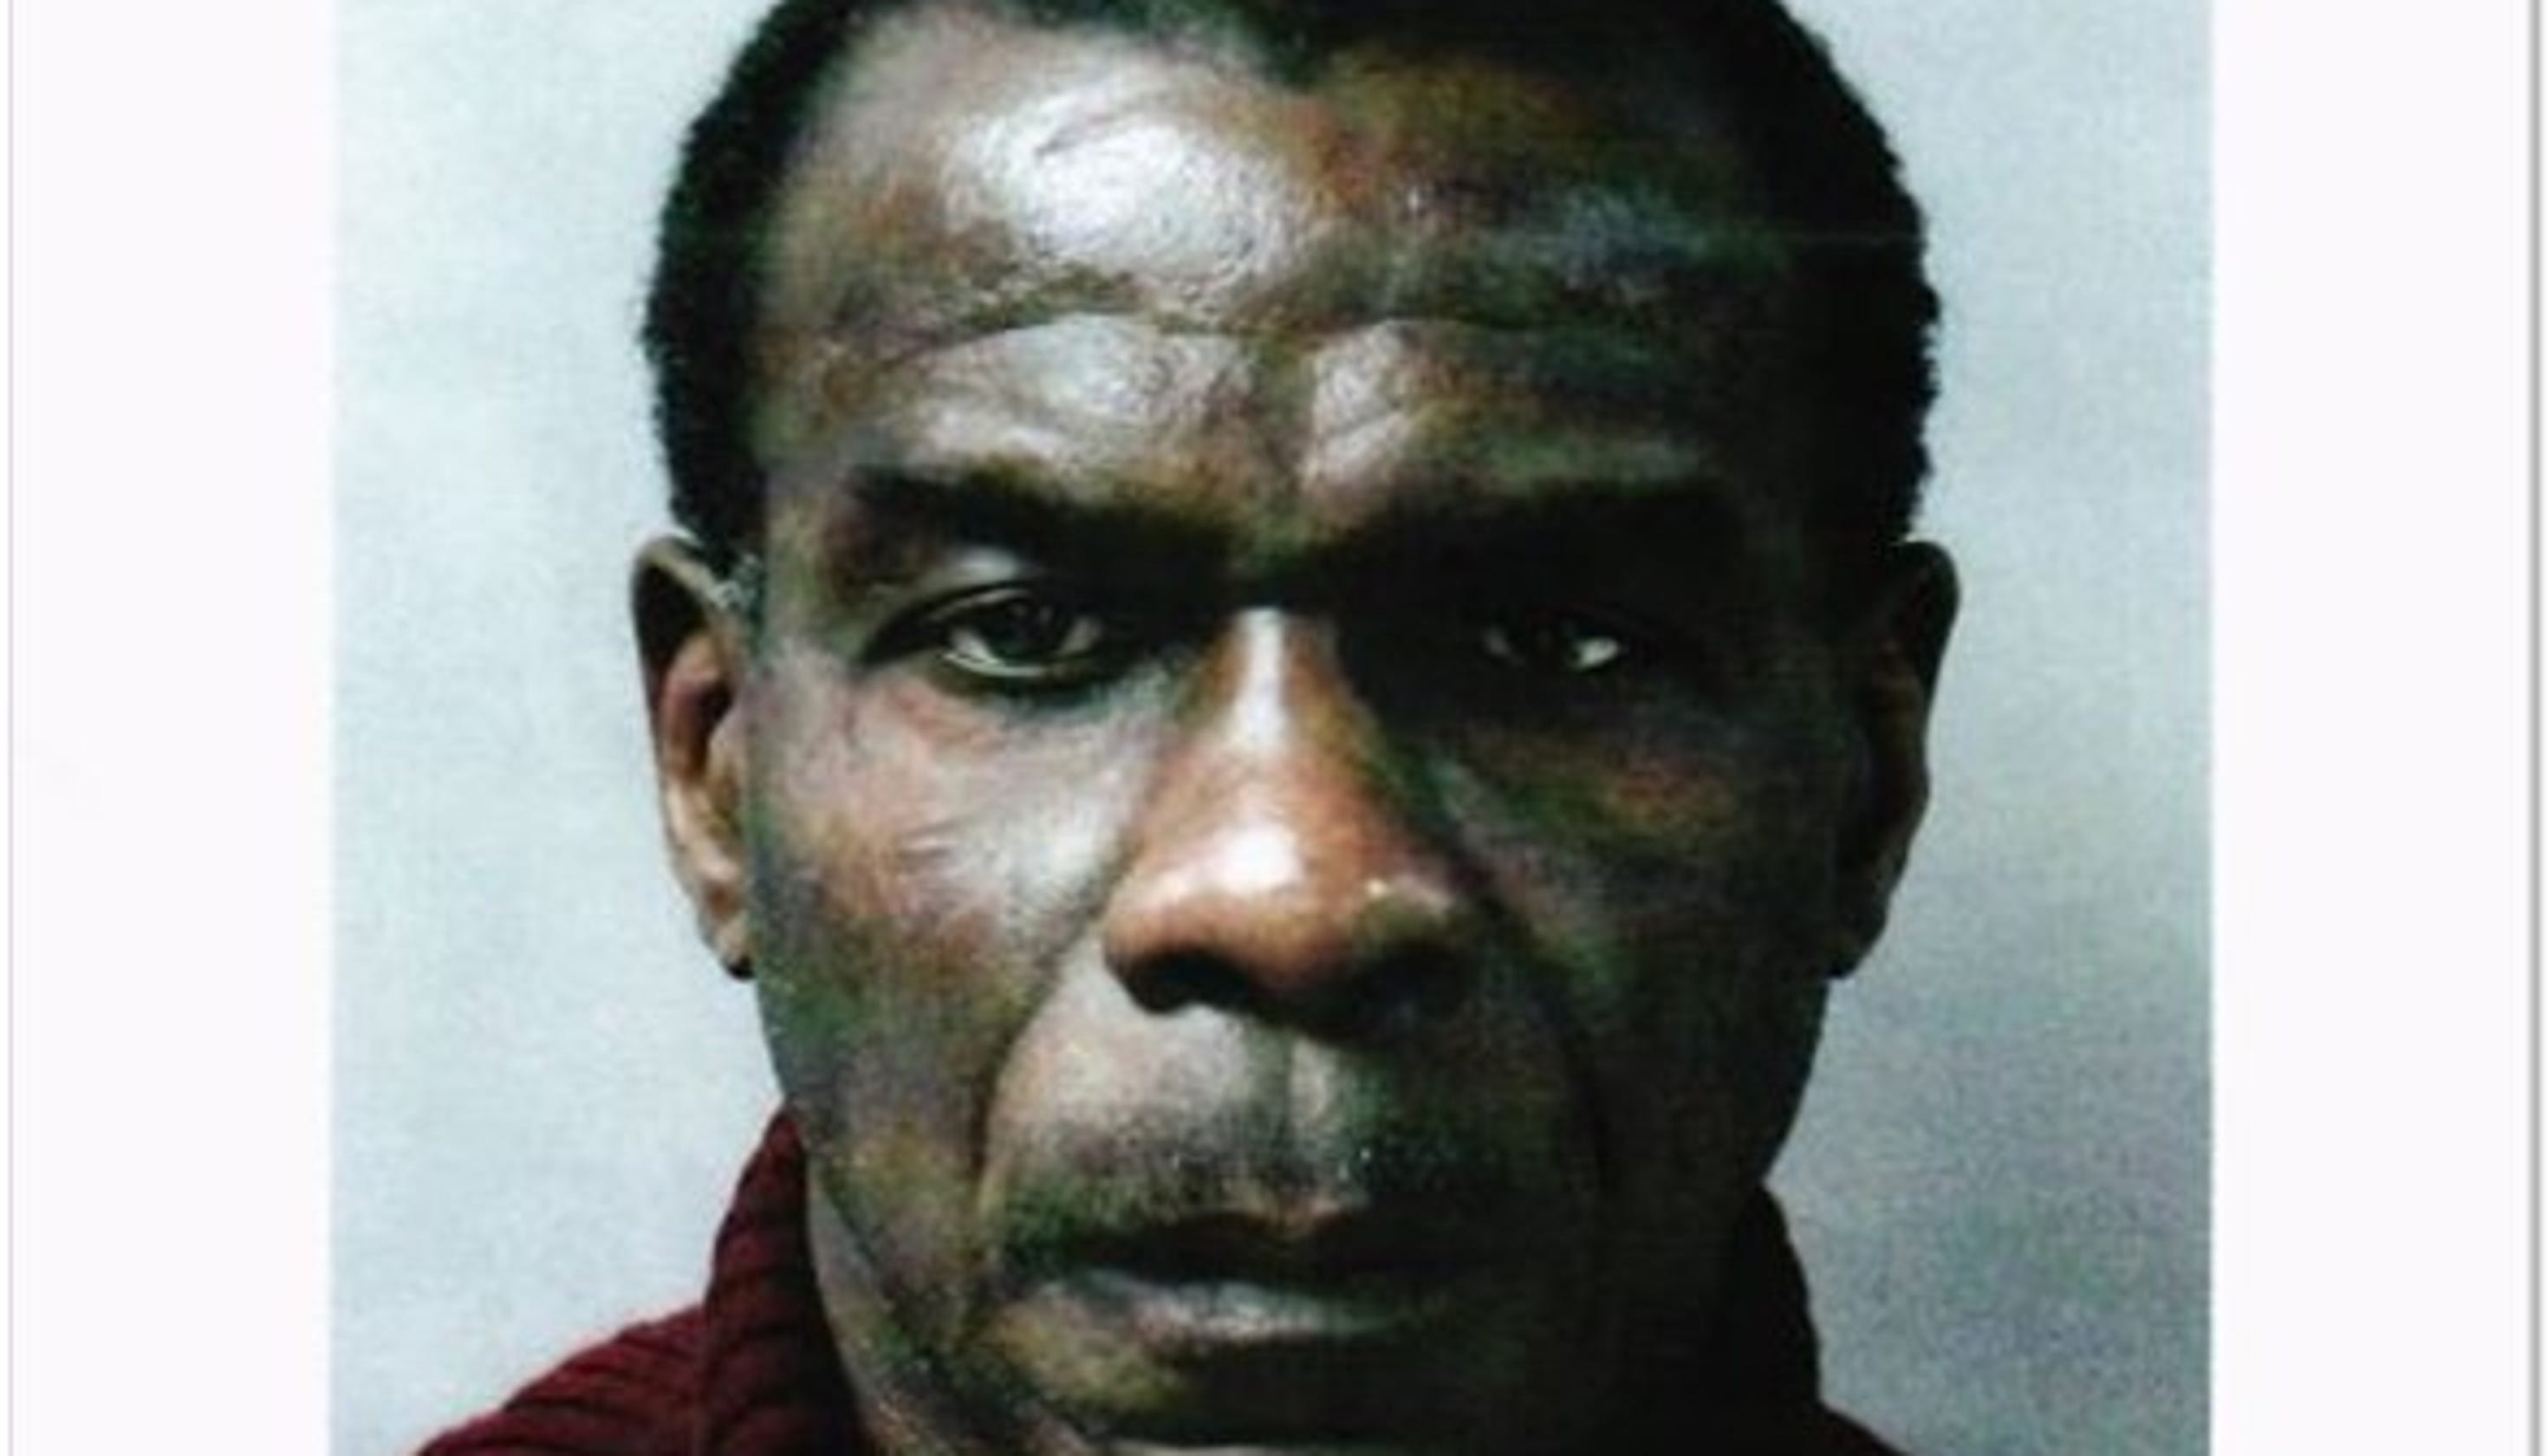 Greece drug kingpin sentenced to life in prison